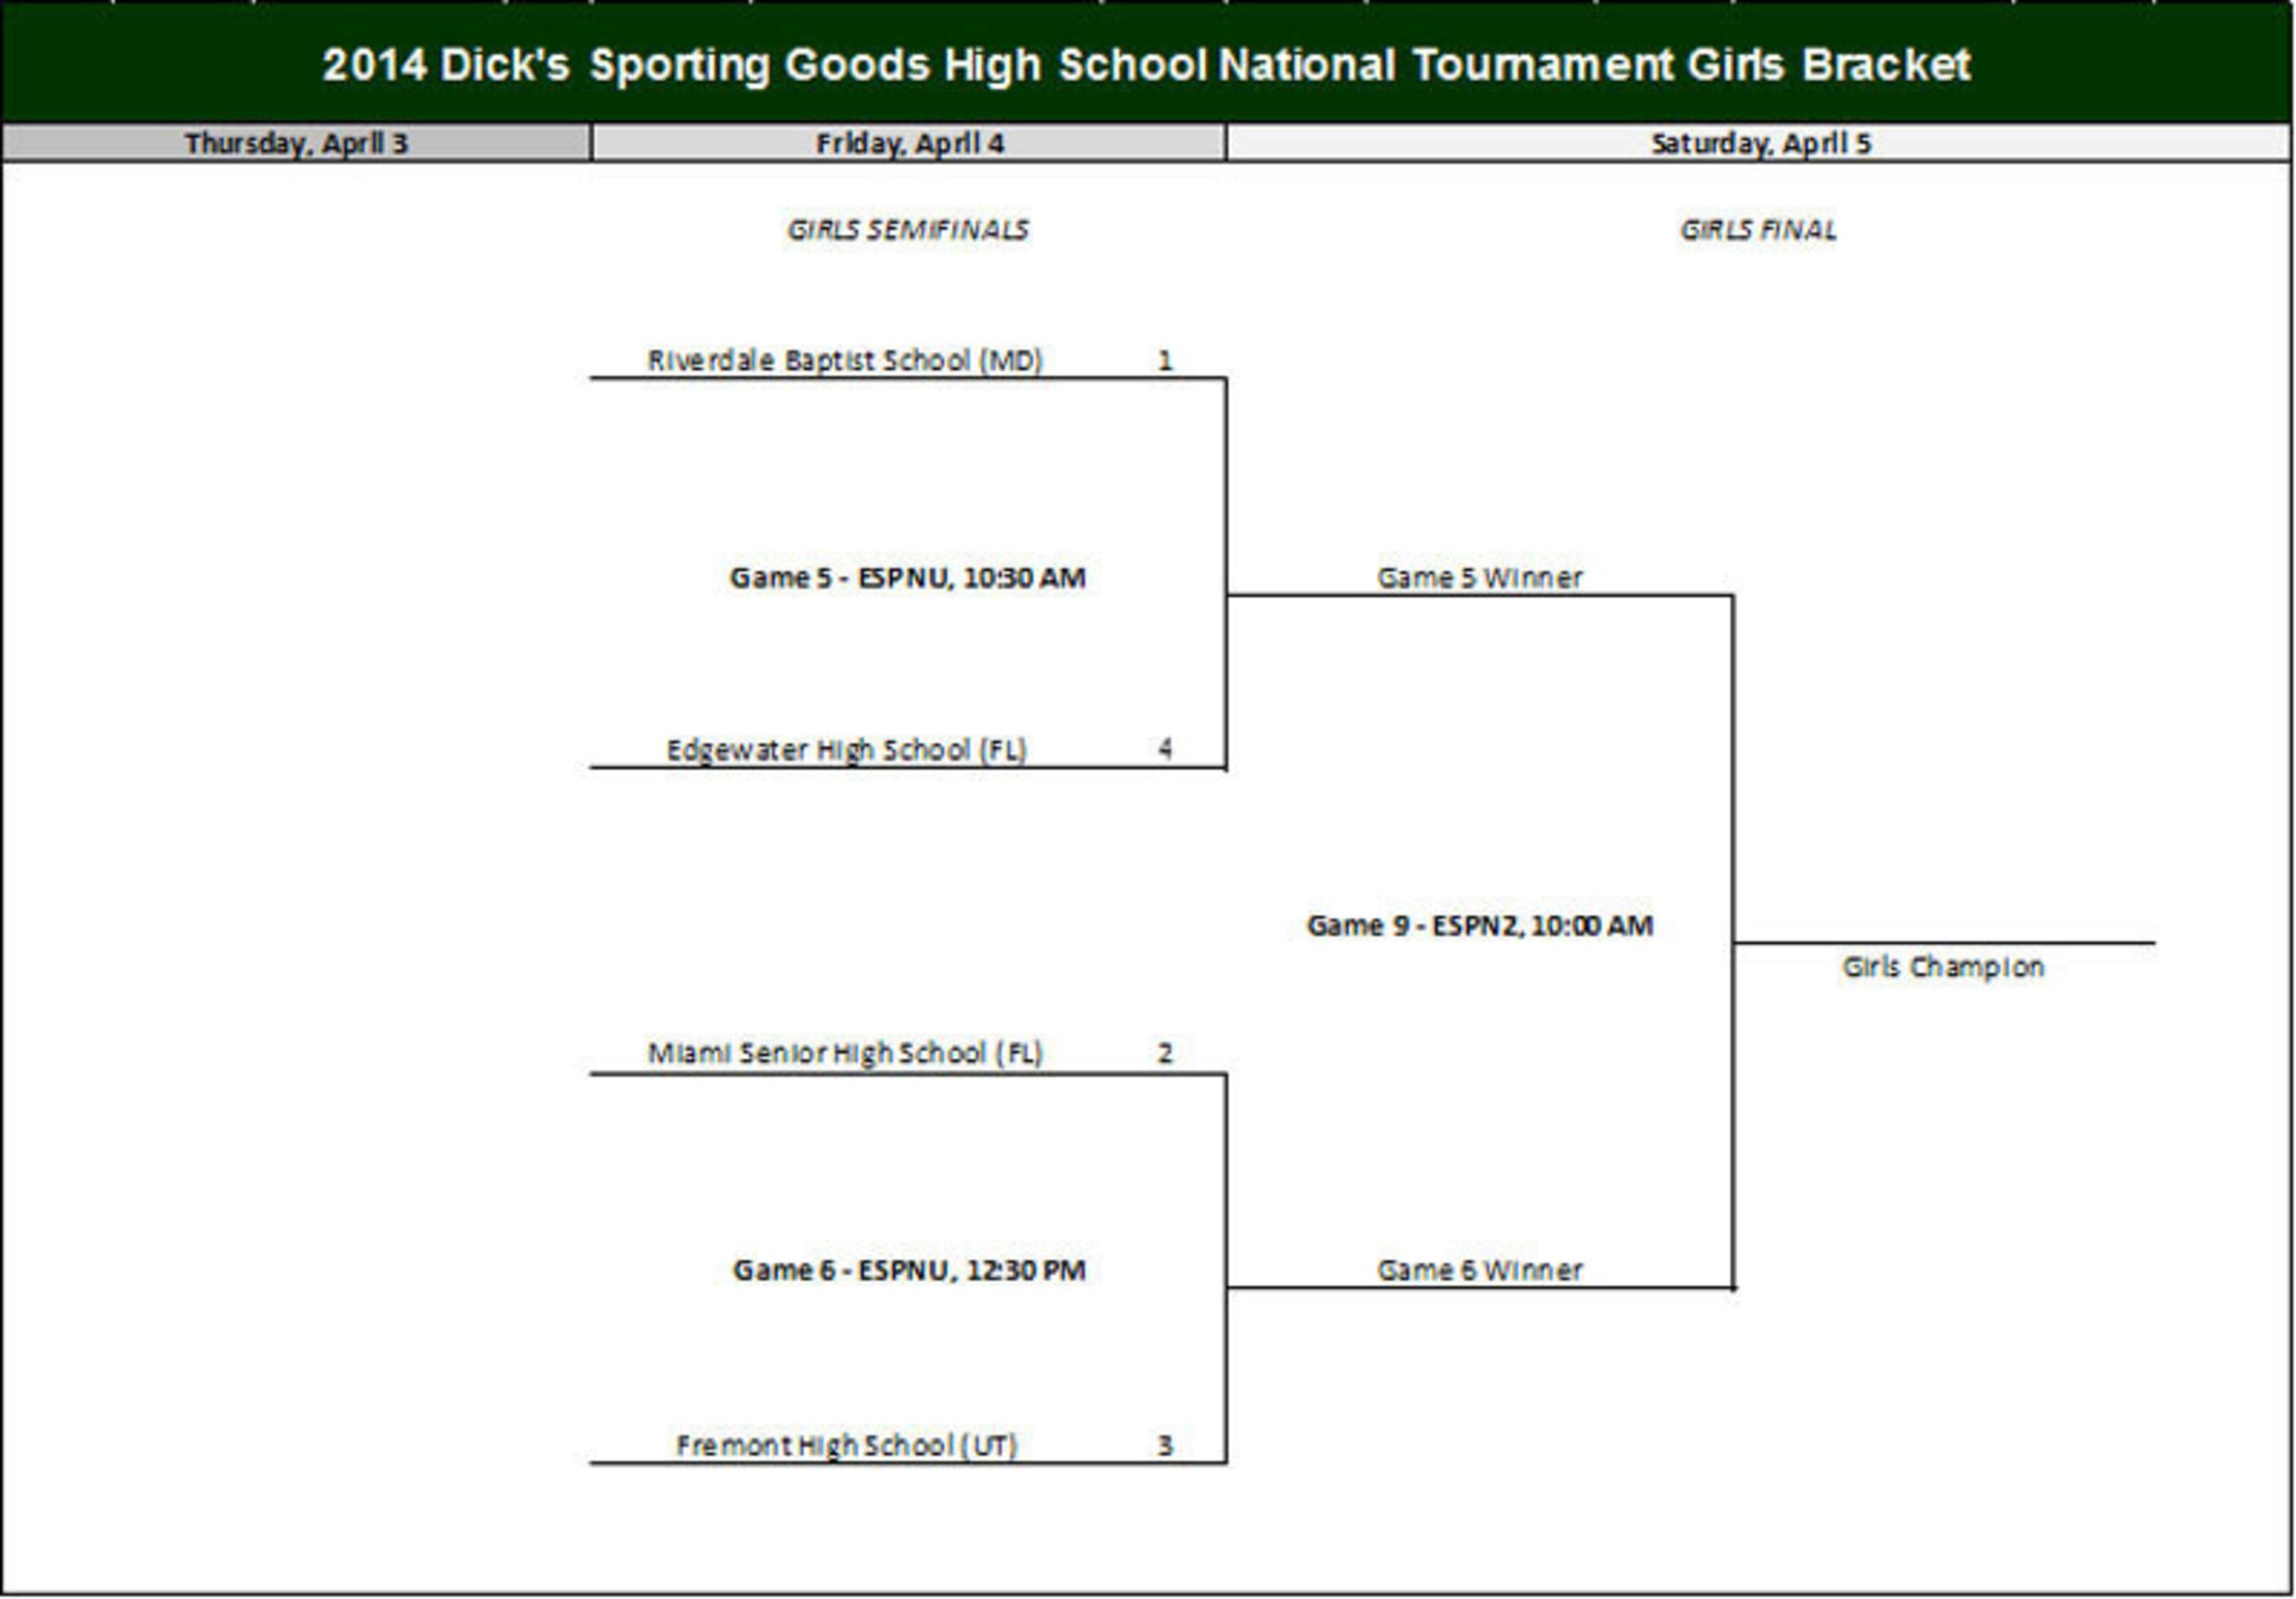 2014 DICK'S Sporting Goods High School National Tournament Girls Bracket. (PRNewsFoto/DICK'S Sporting Goods, Inc.) (PRNewsFoto/DICK'S SPORTING GOODS, INC.)